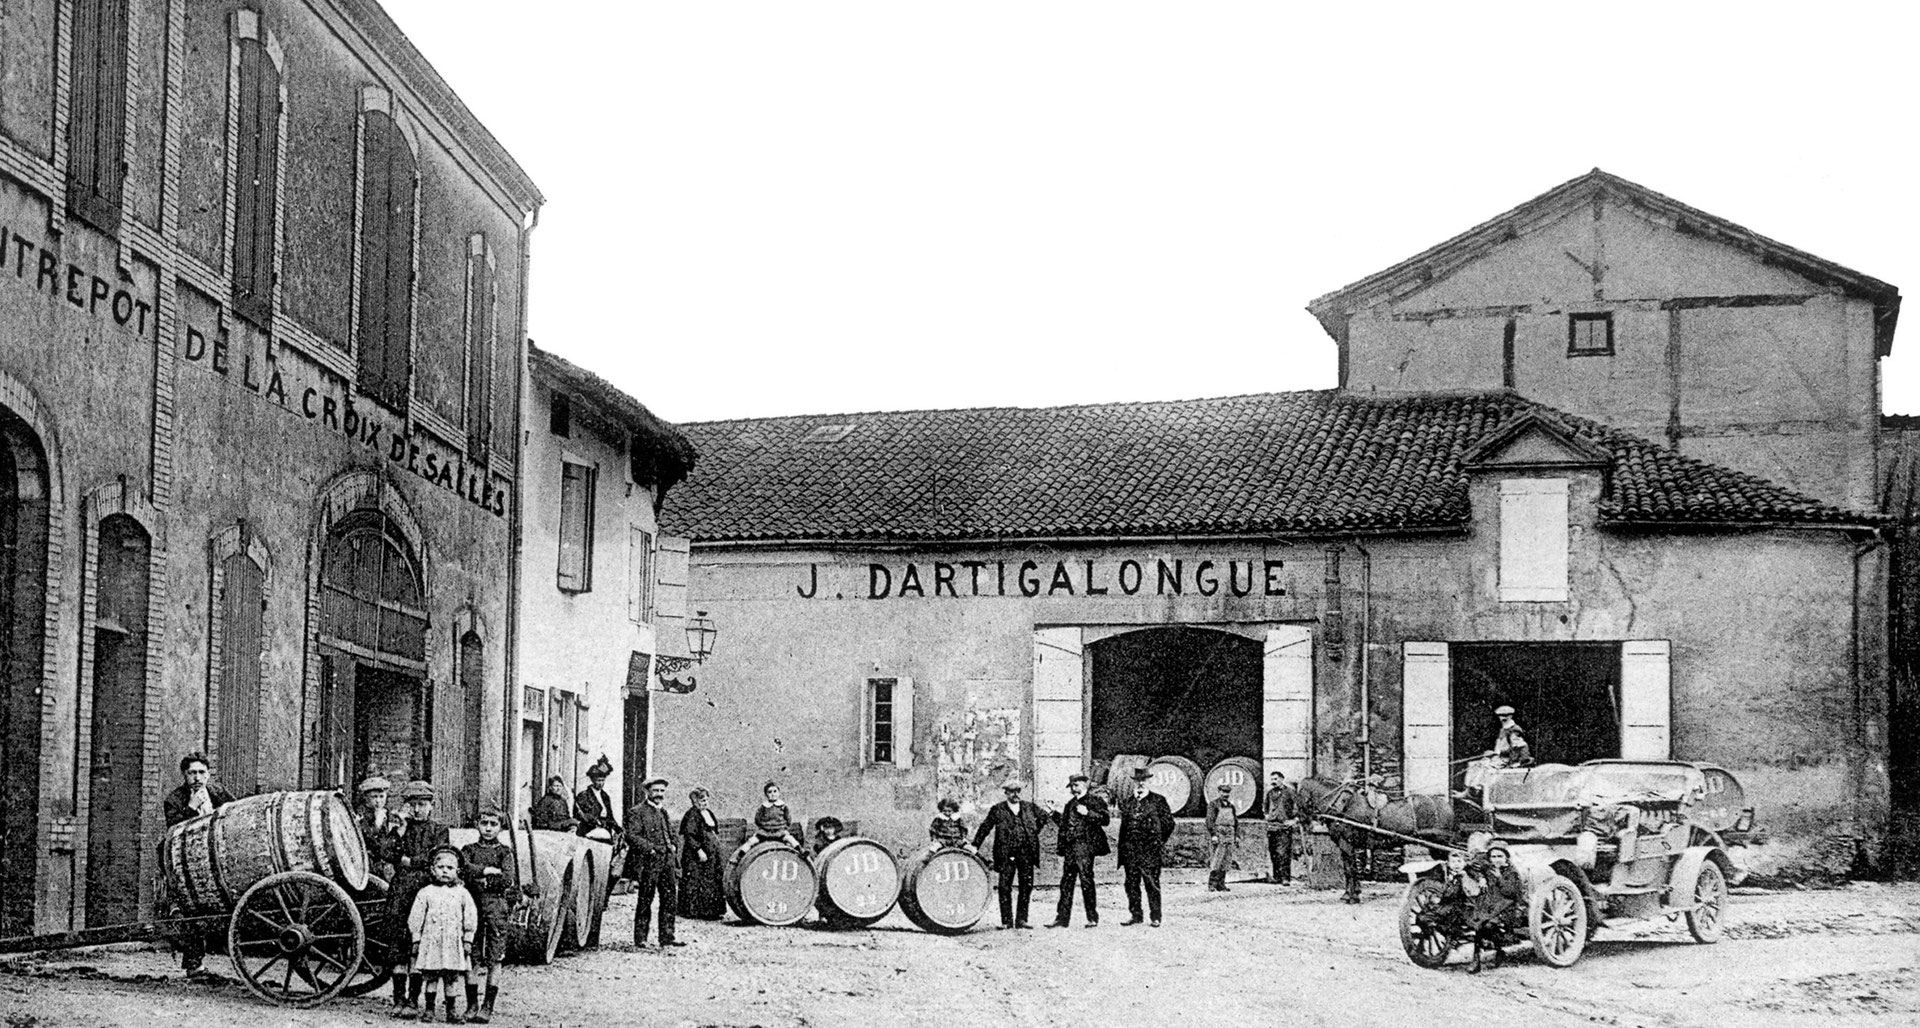 Dartigalongue Bas Armagnac - Importers of French Armagnac